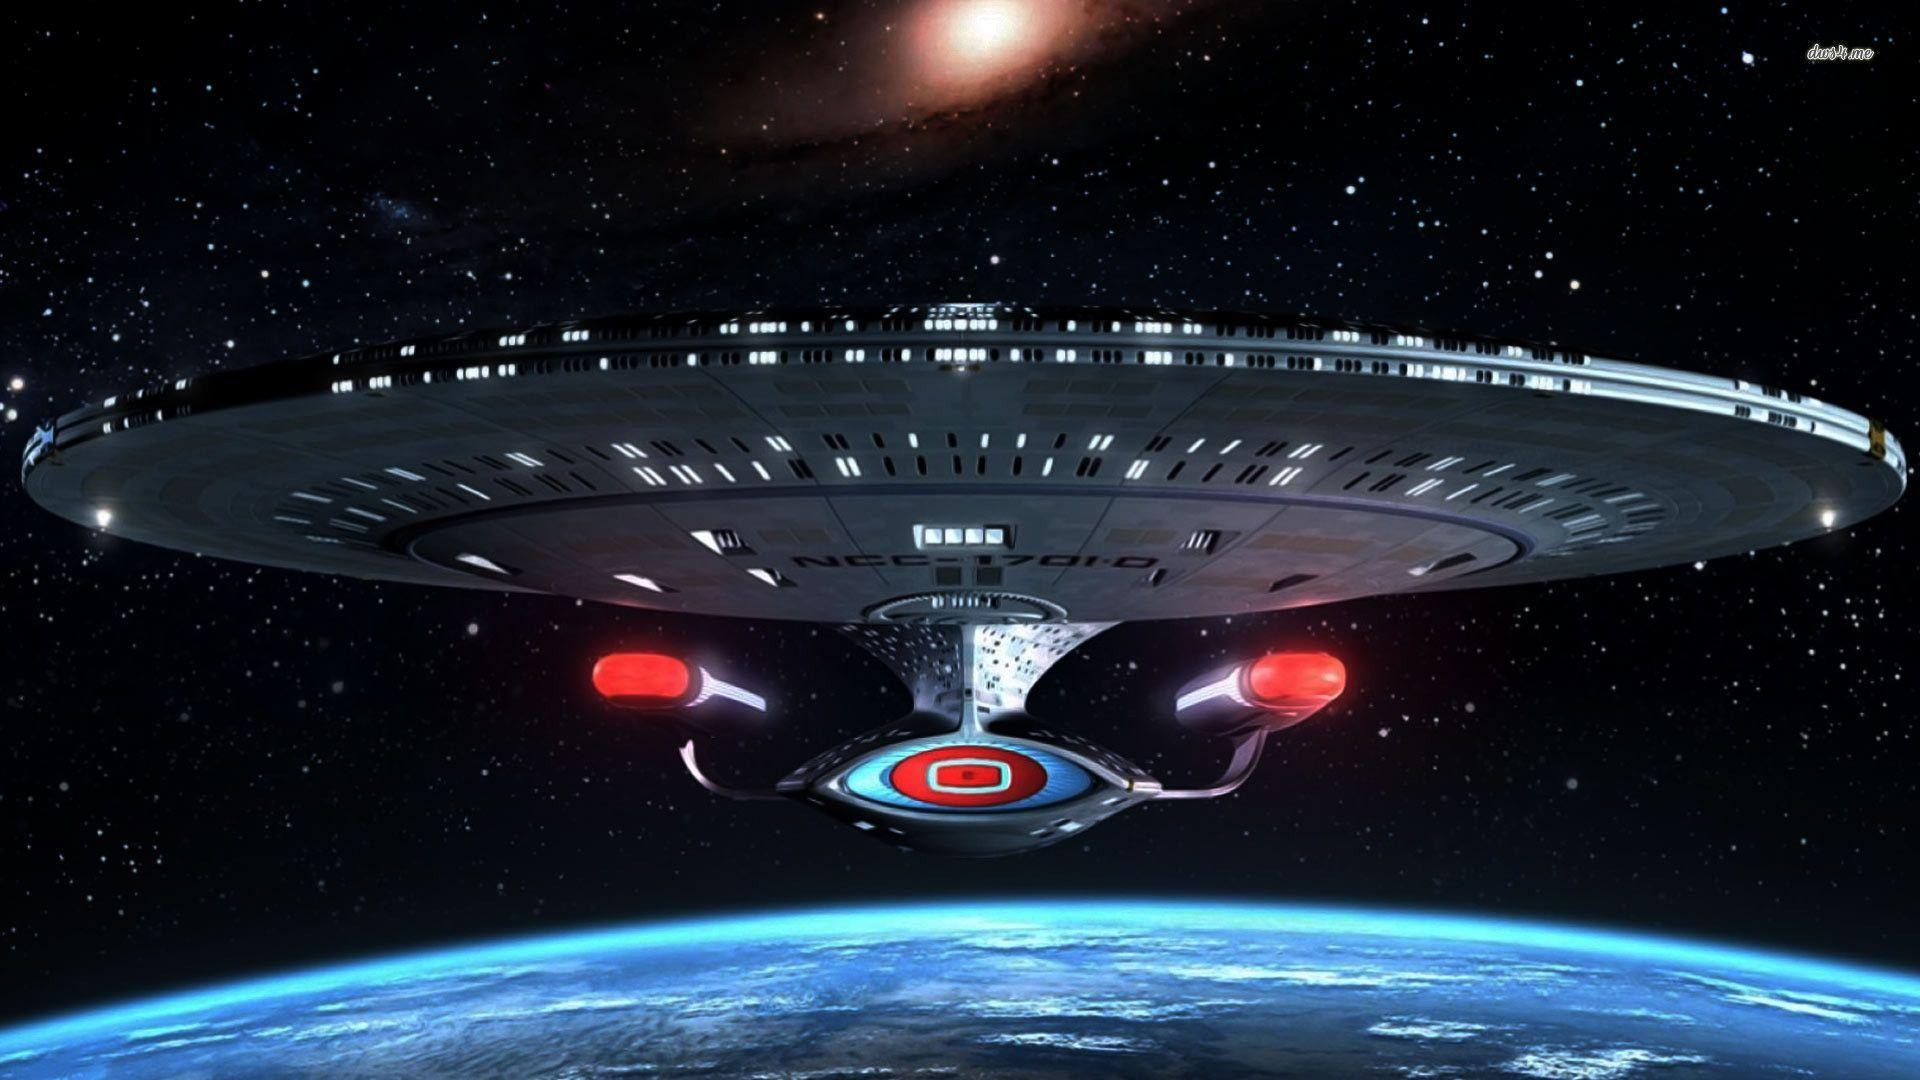 Star Trek Wallpapers 1920x1080 1920x1080